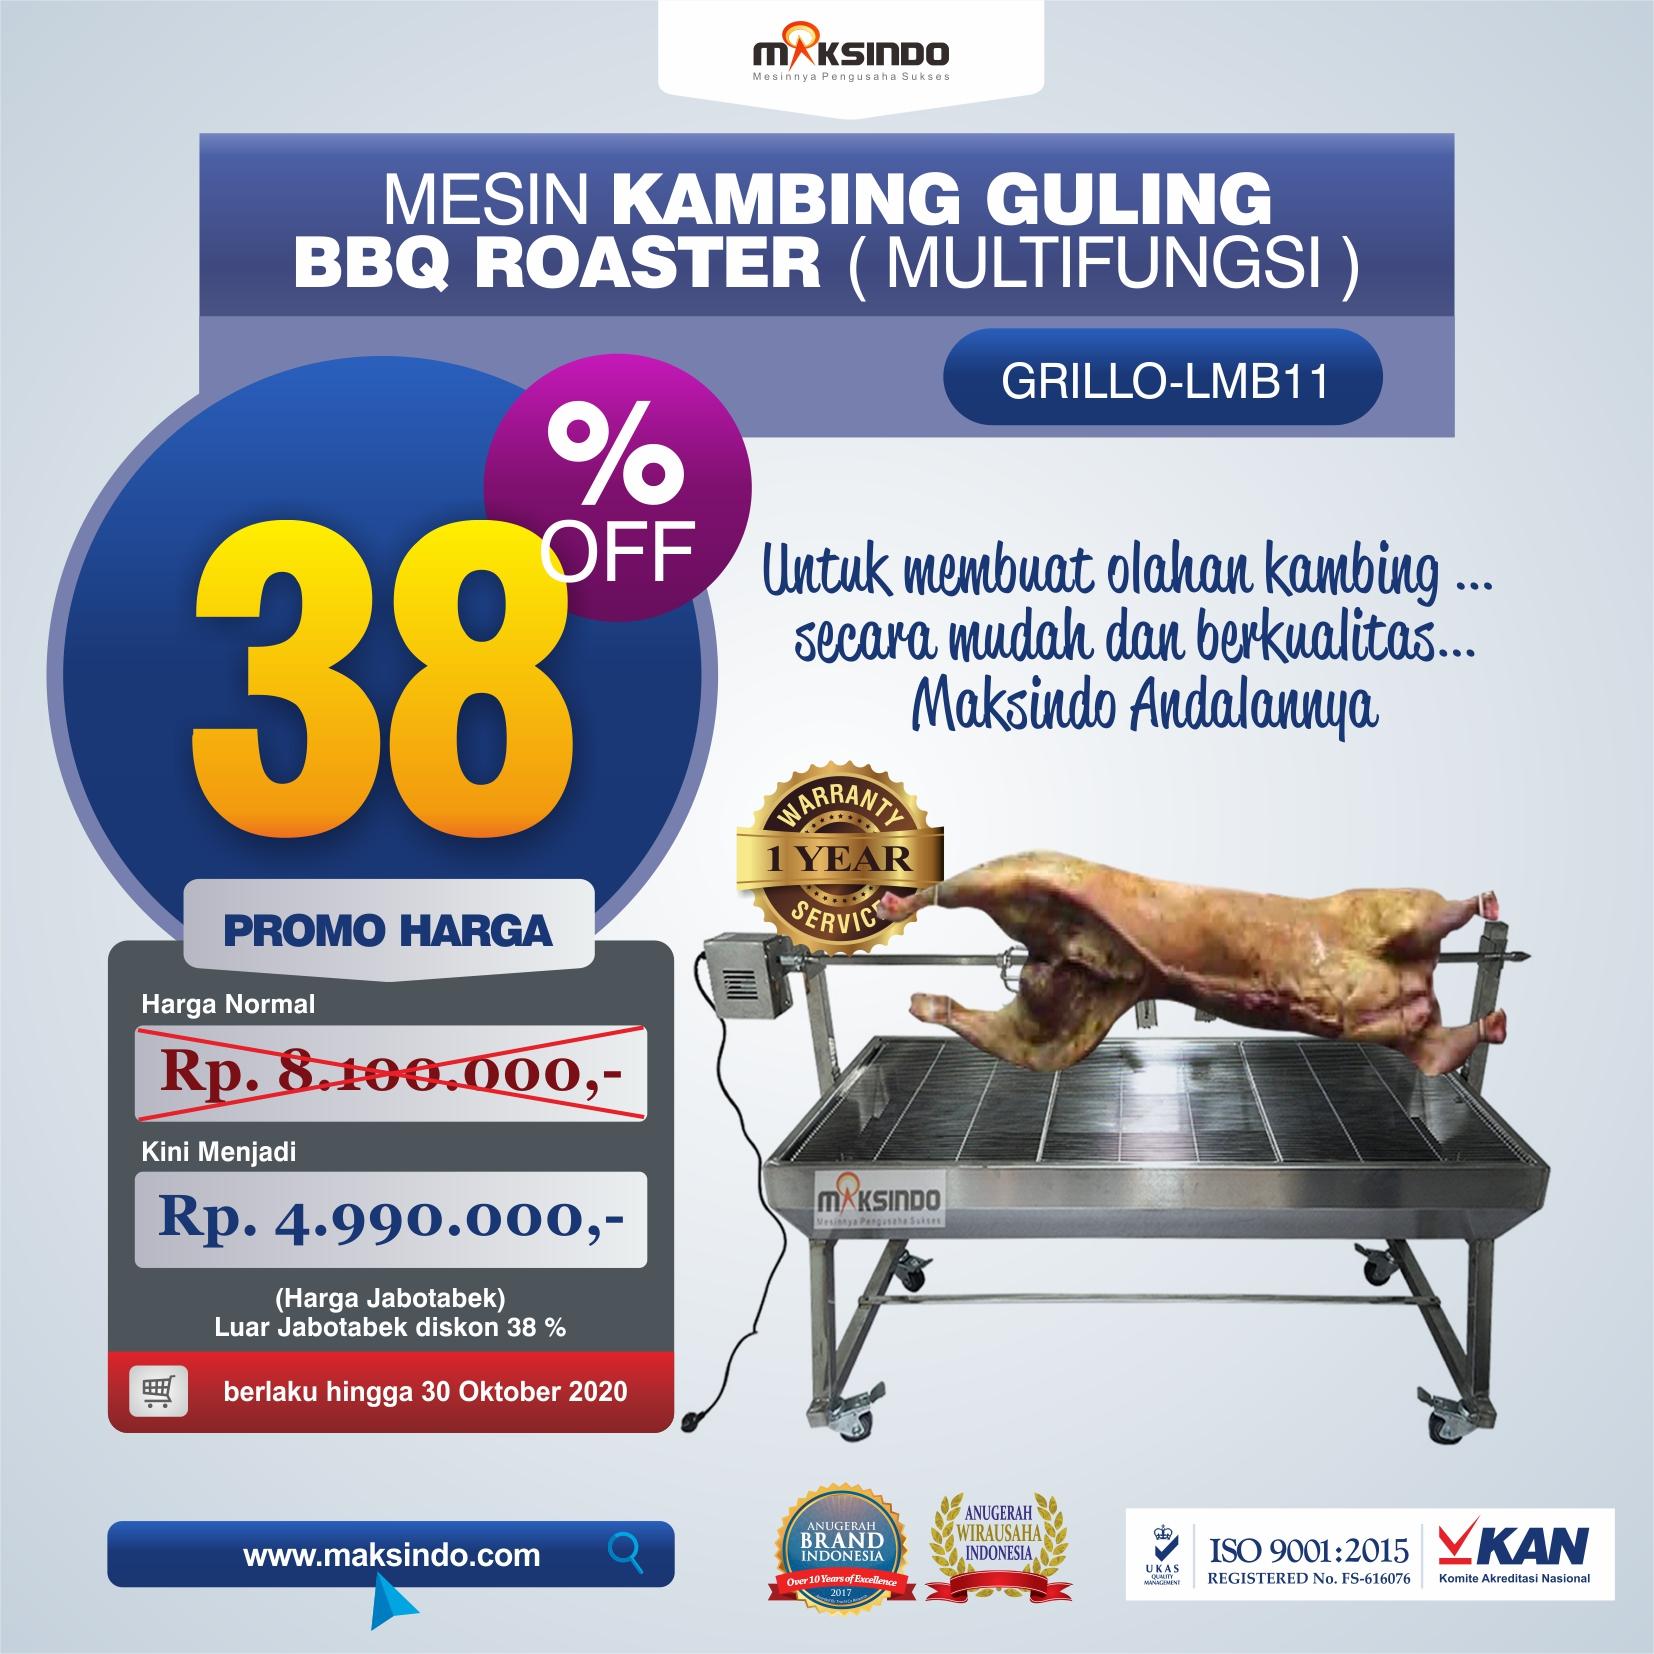 Jual Mesin Kambing Guling BBQ Roaster (GRILLO-LMB11) di bandung